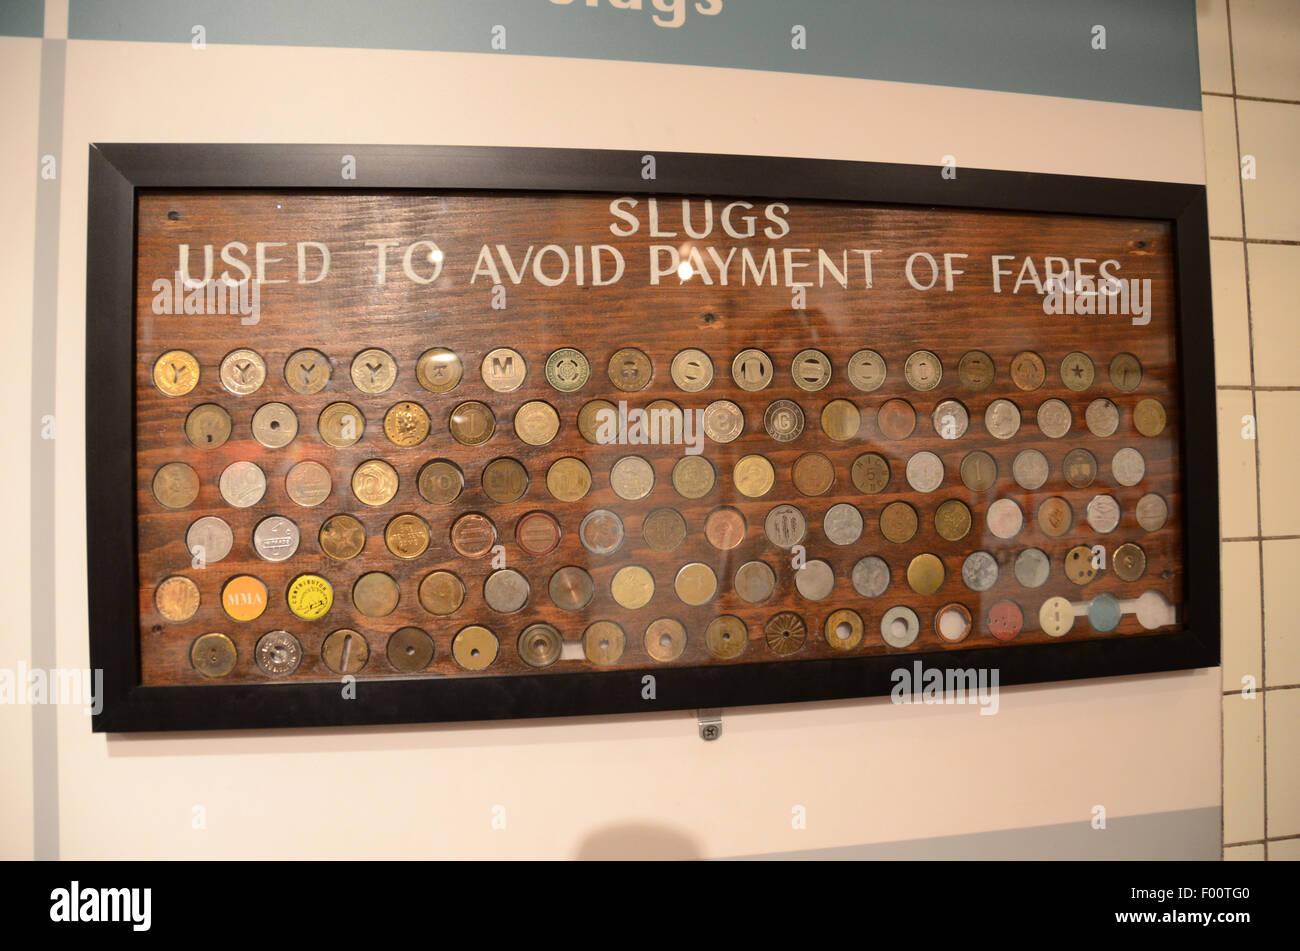 Museo de Tránsito de Nueva York tarifa tokens evasión babosas monedas falsas Imagen De Stock